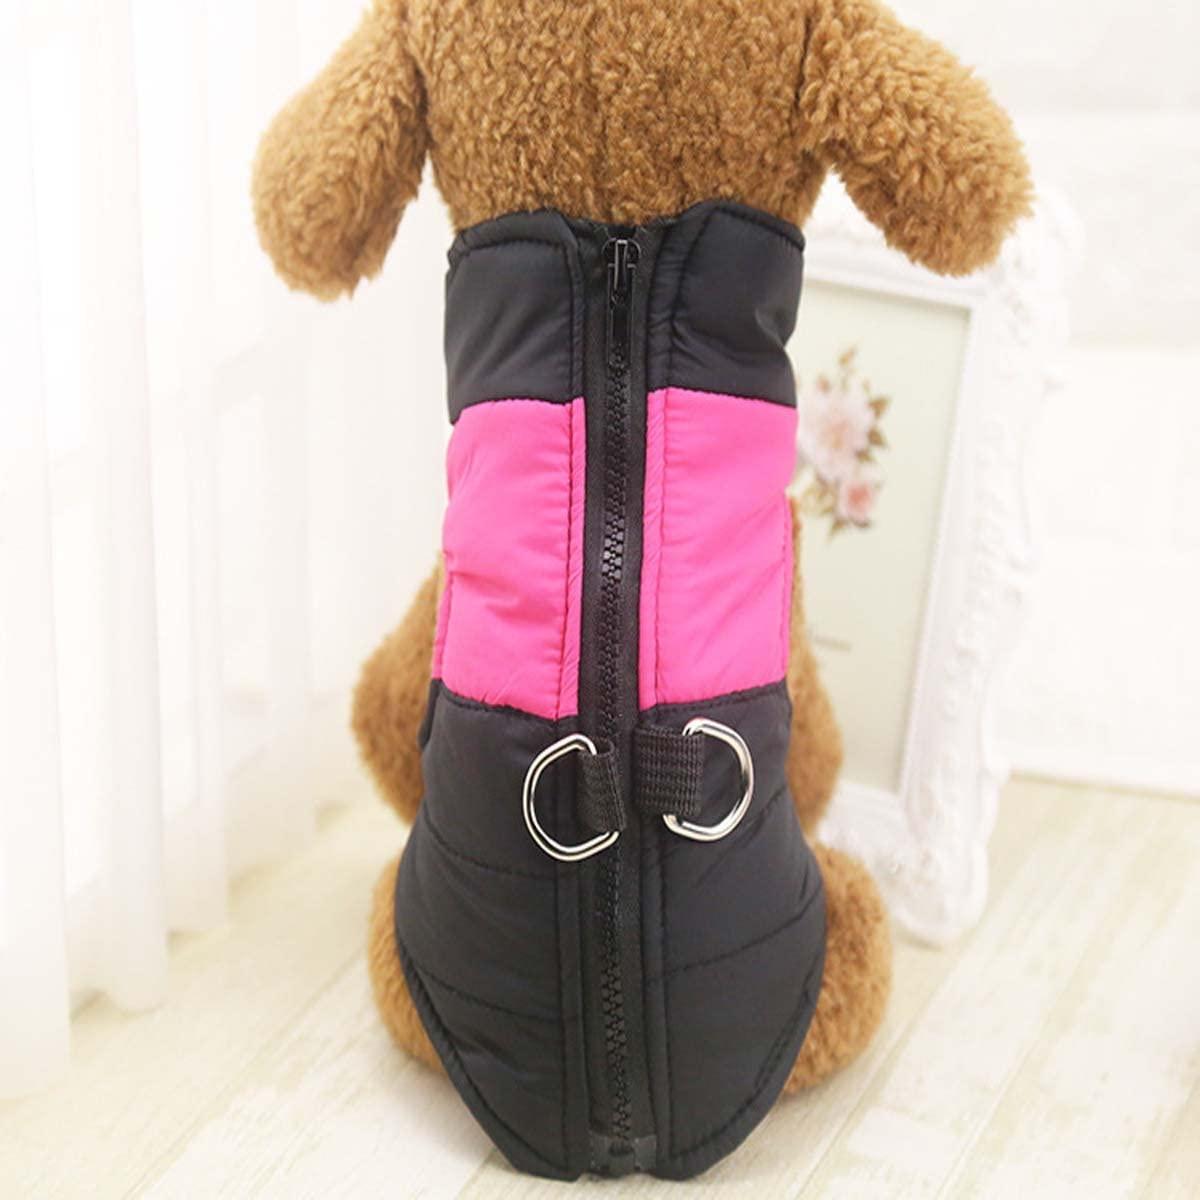 Nylon Dog Pet Cat Puppy Vest Winter Warm Jacket Coat Clothes Outdoor Soft Apparel